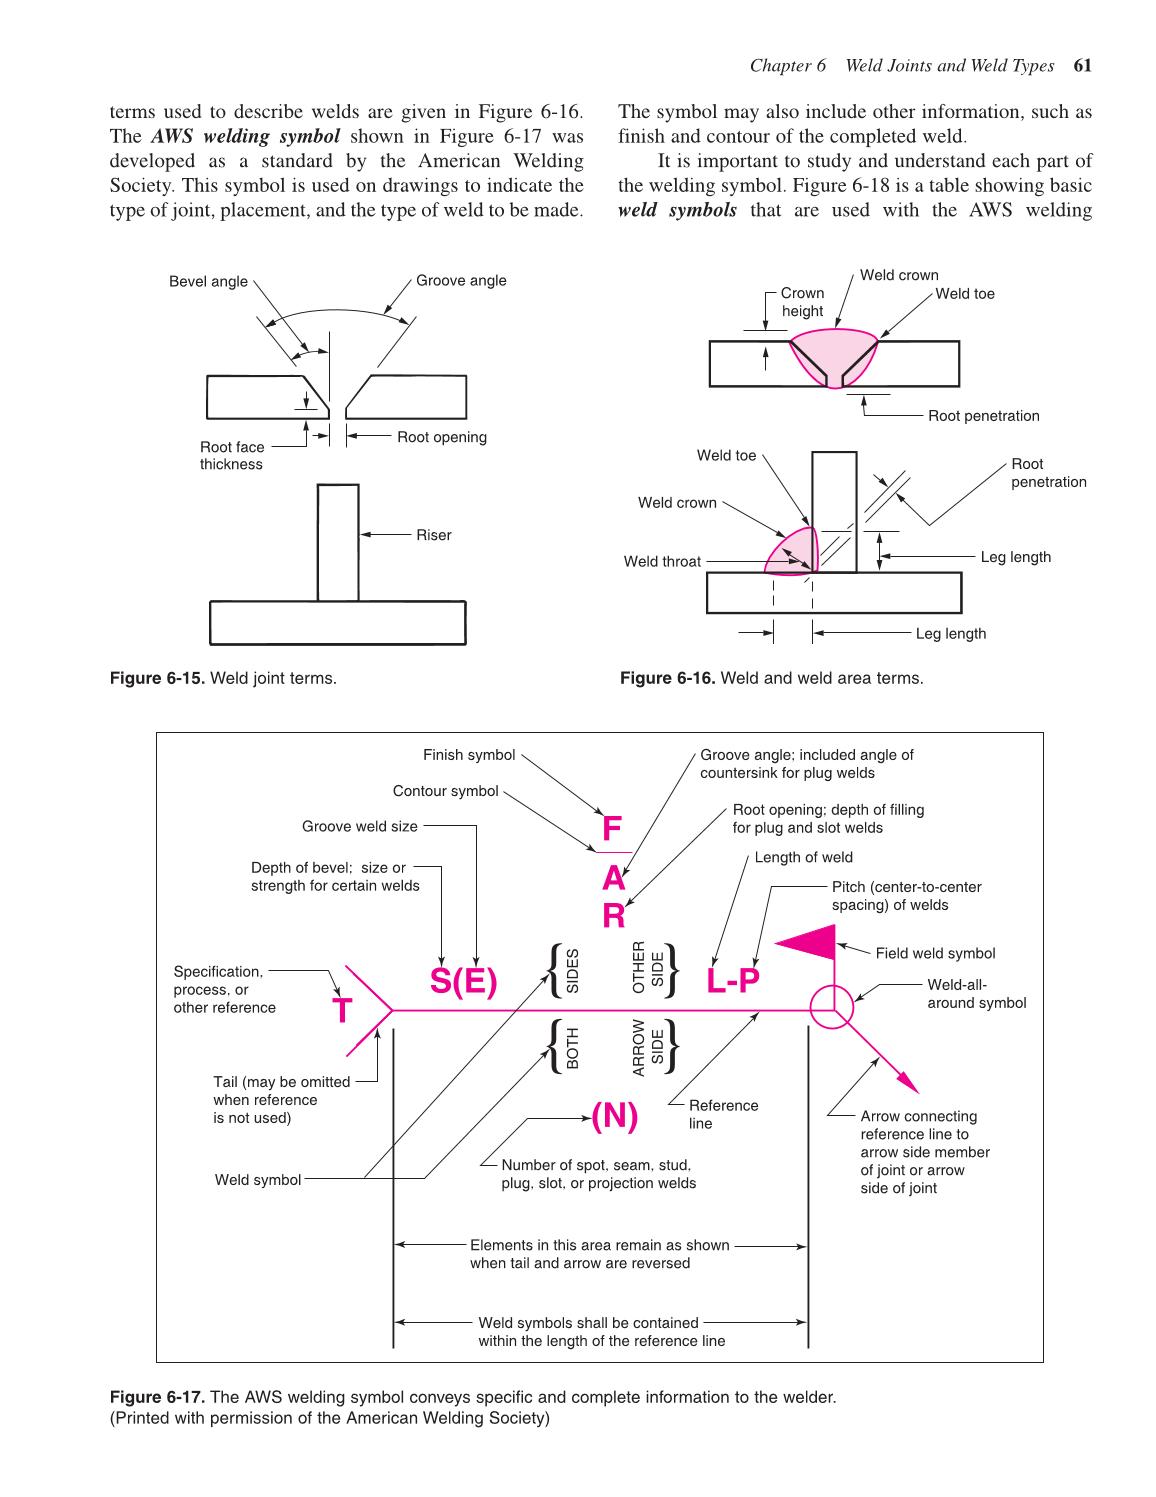 Gas Metal Arc Welding Handbook 5th Edition Page 61 61 Of 176